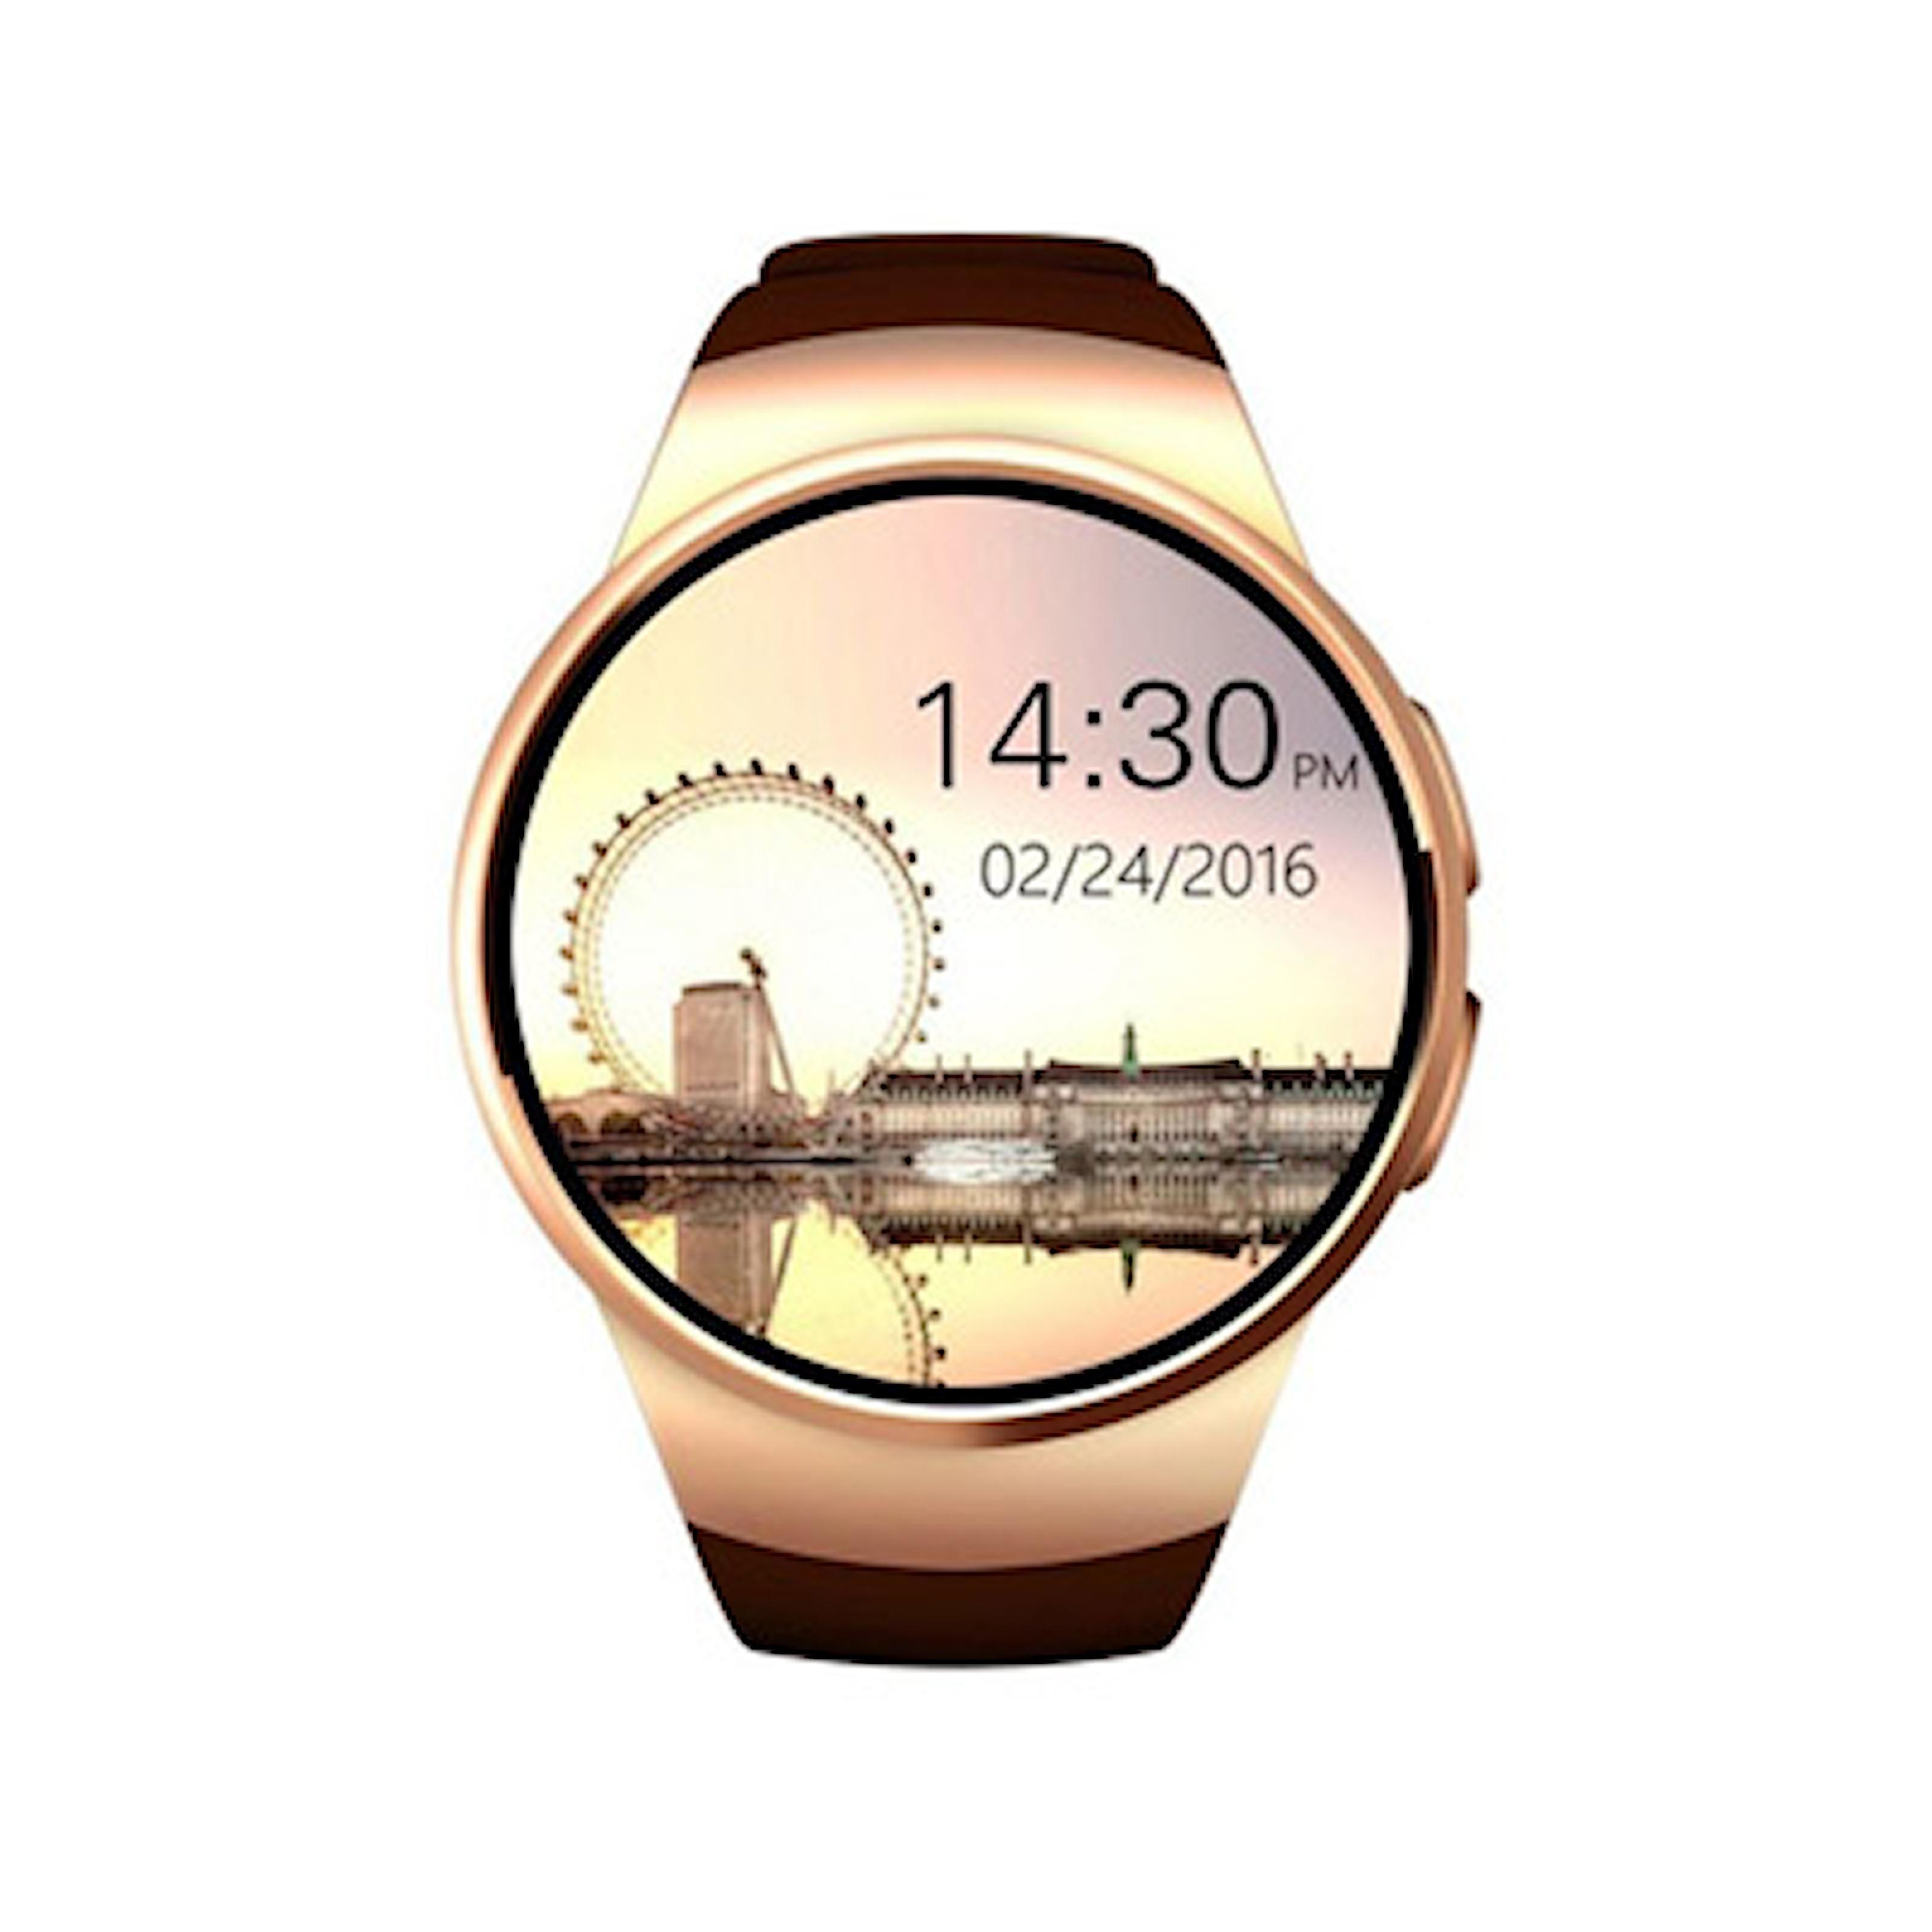 Guld/Brun, 2in1 Bluetooth Watch & Fitness Tracker, 3 Colors, Smartwatch, ,